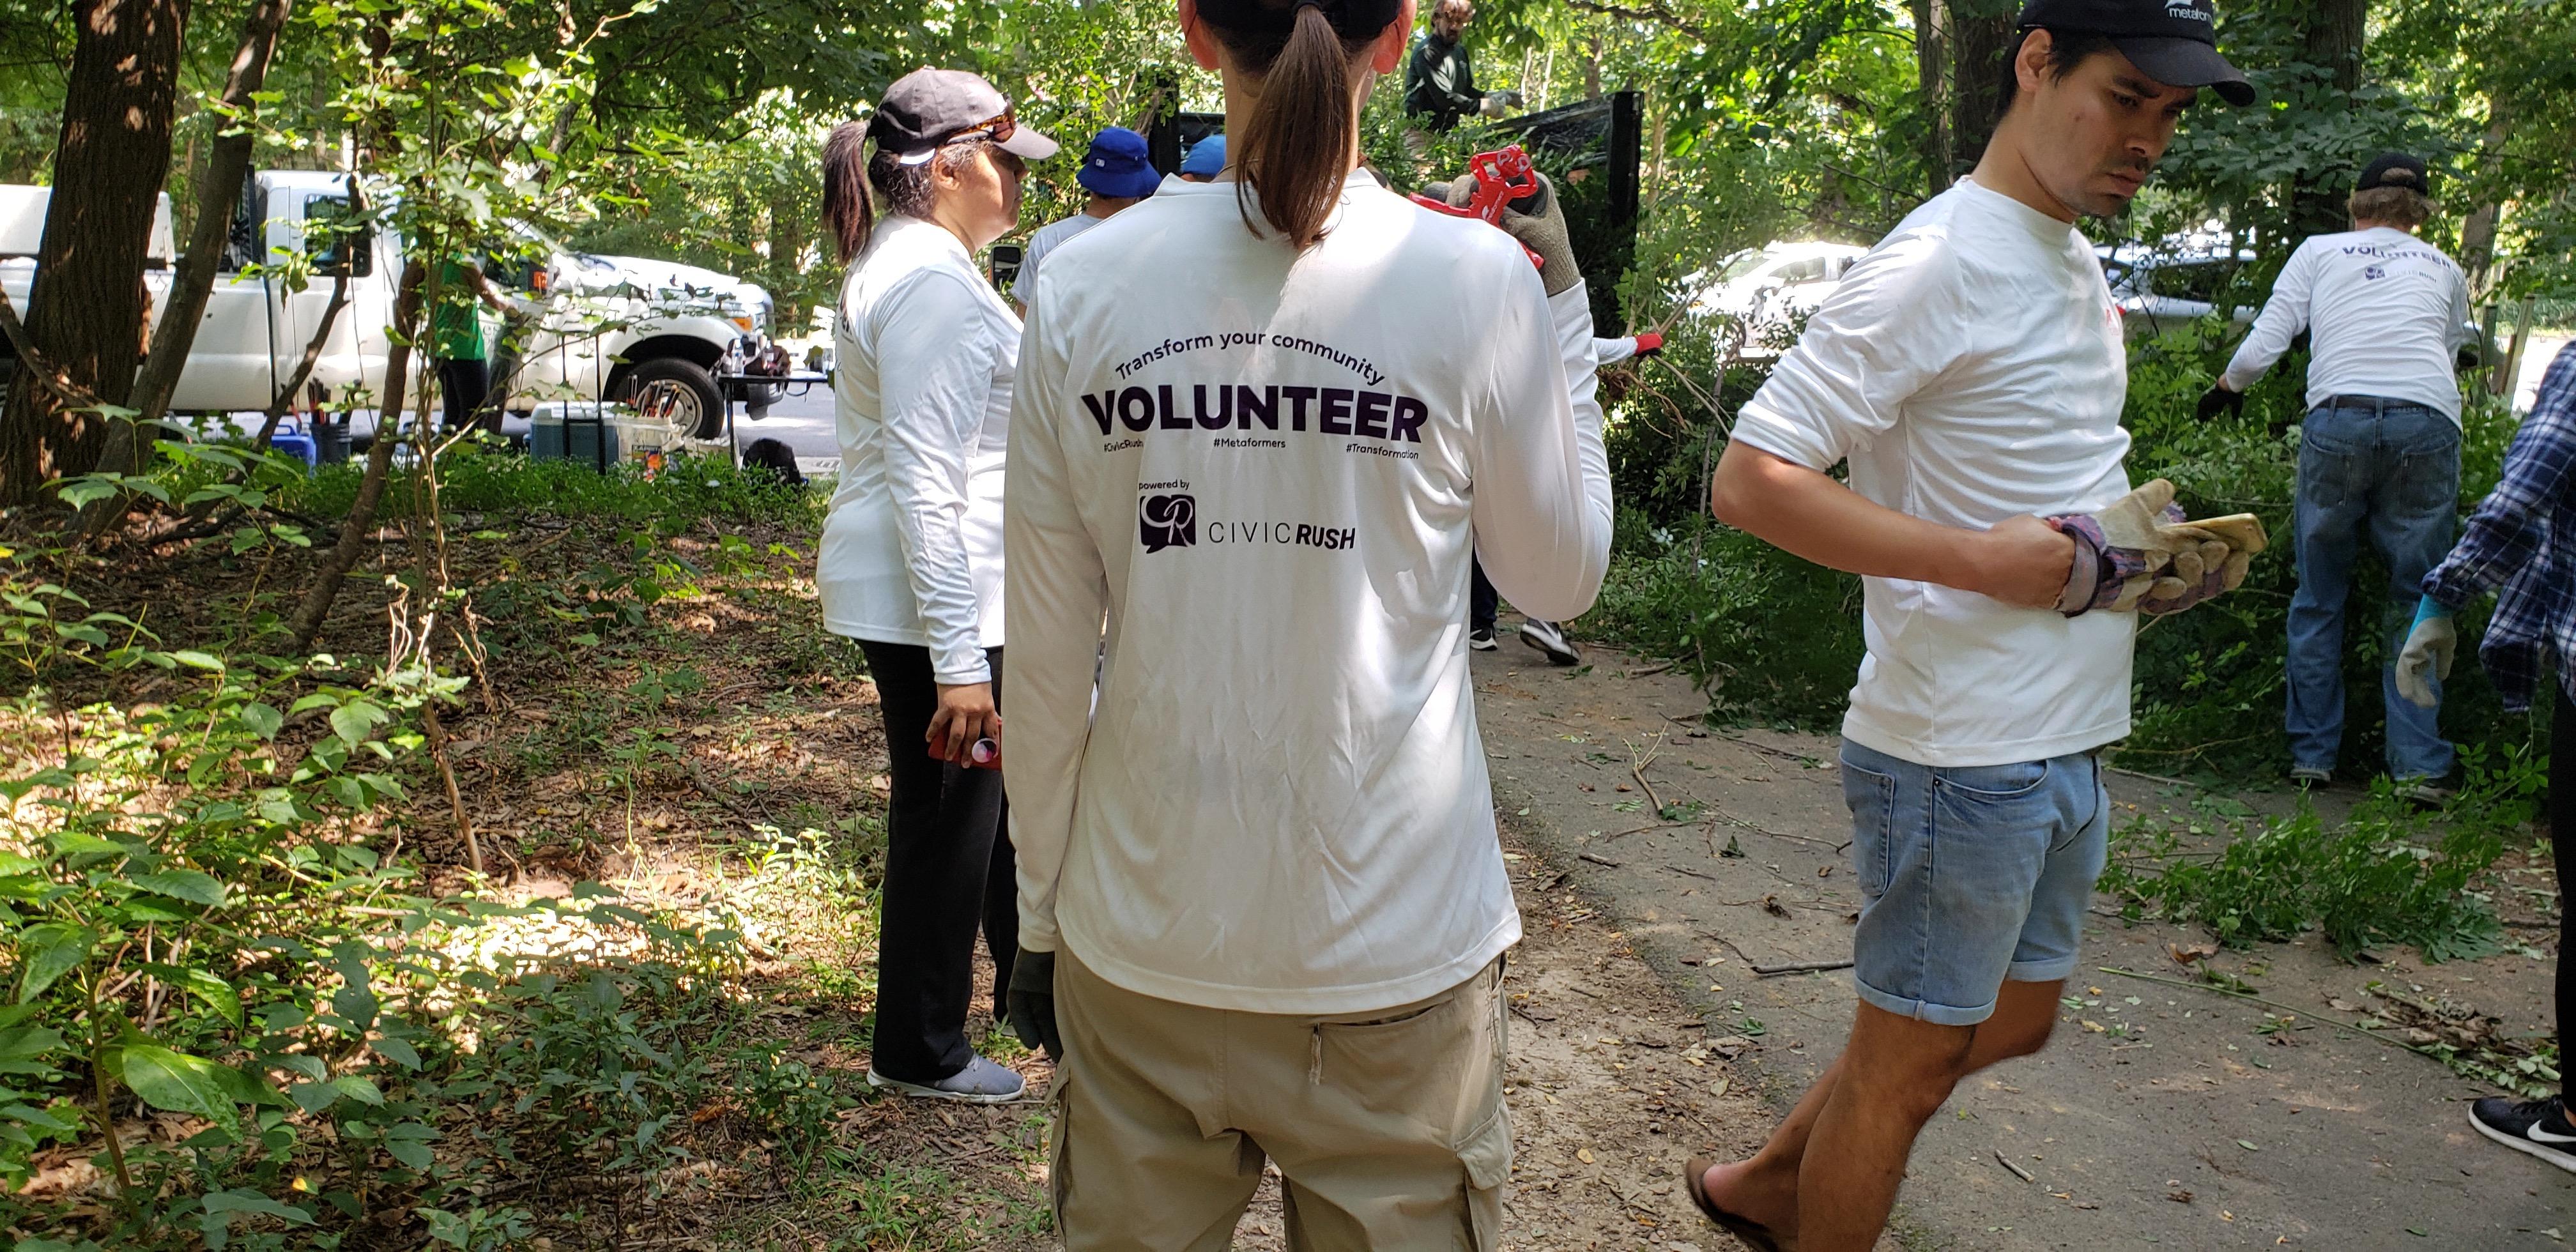 Metaformers participates in Habitat Heroes project